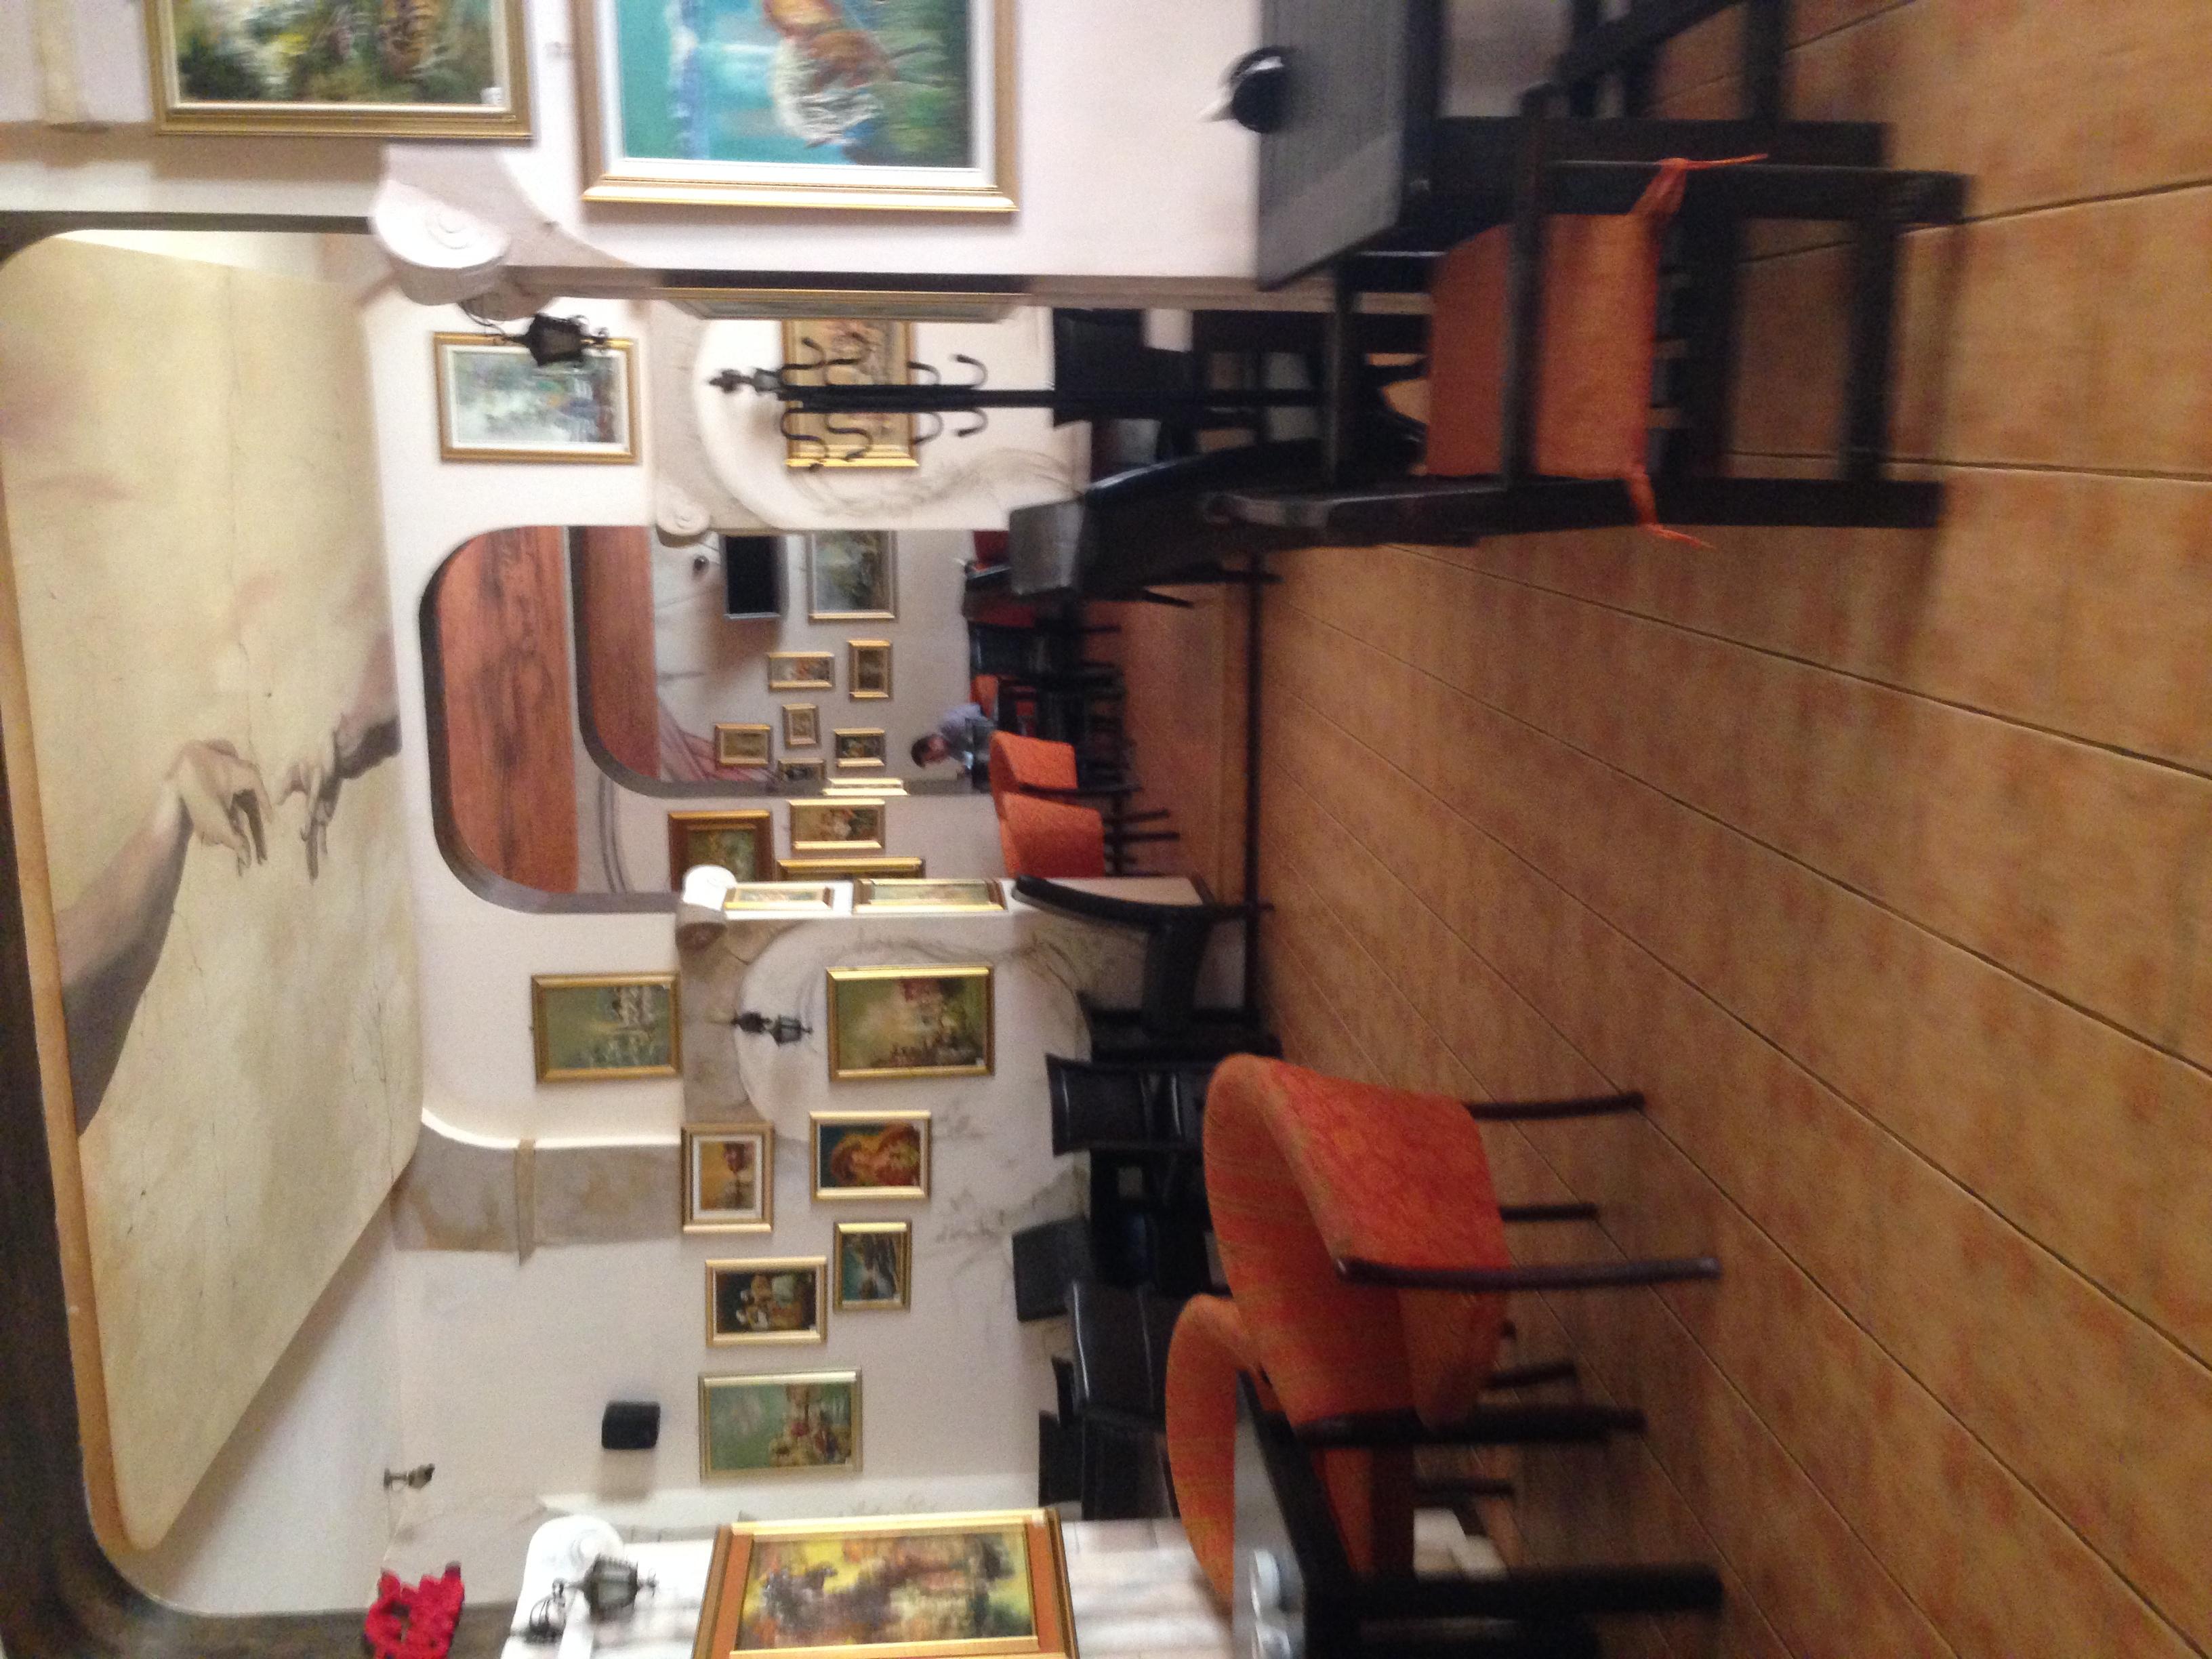 Vendita bar ristorante nightclub bucharest bucharest - Agenzie immobiliari bucarest ...